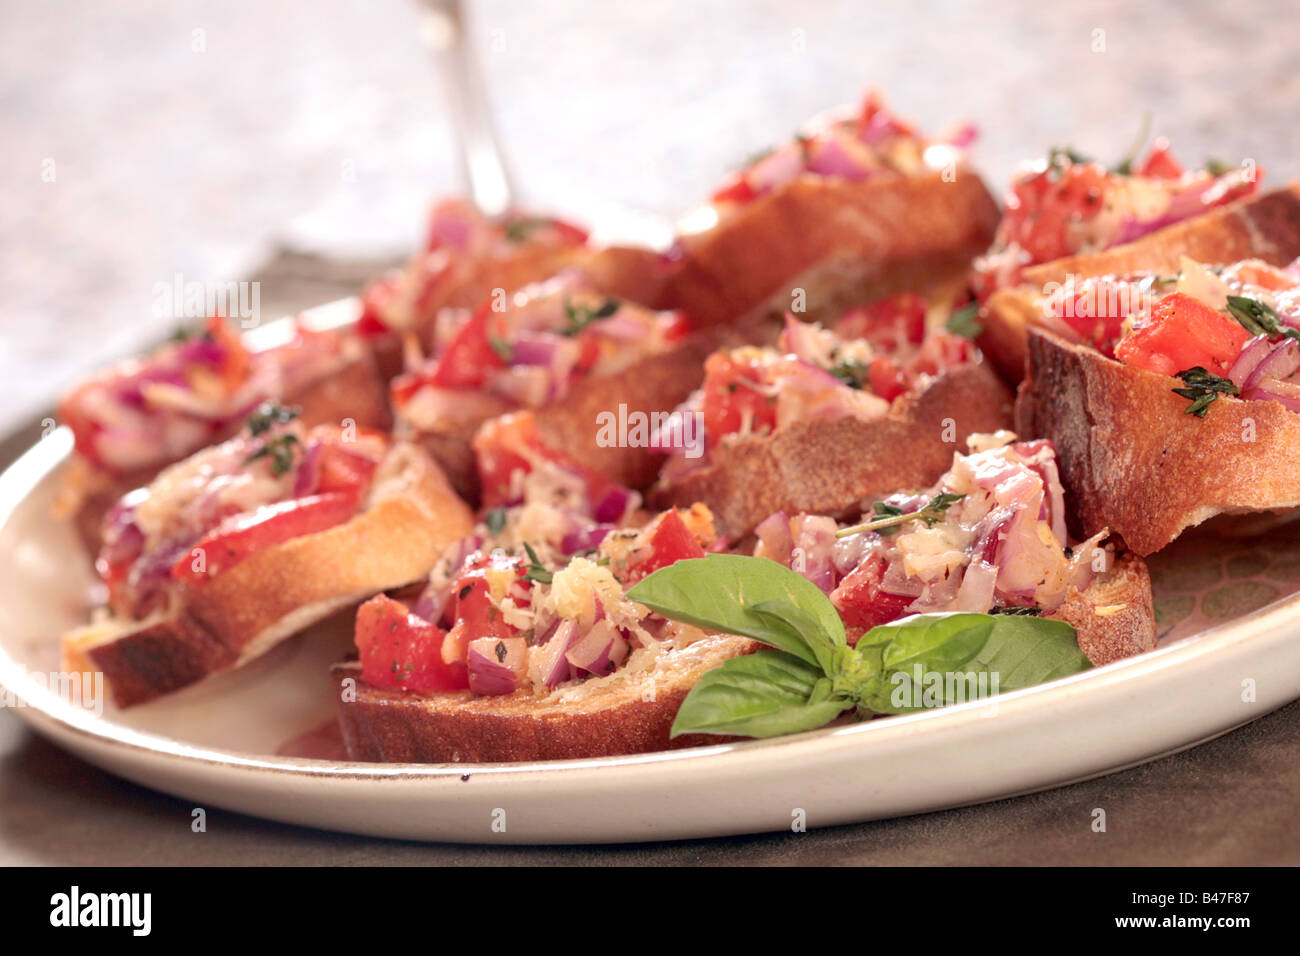 Plate of Bruschetta Appetizer Waiting to Be Eaten - Stock Image